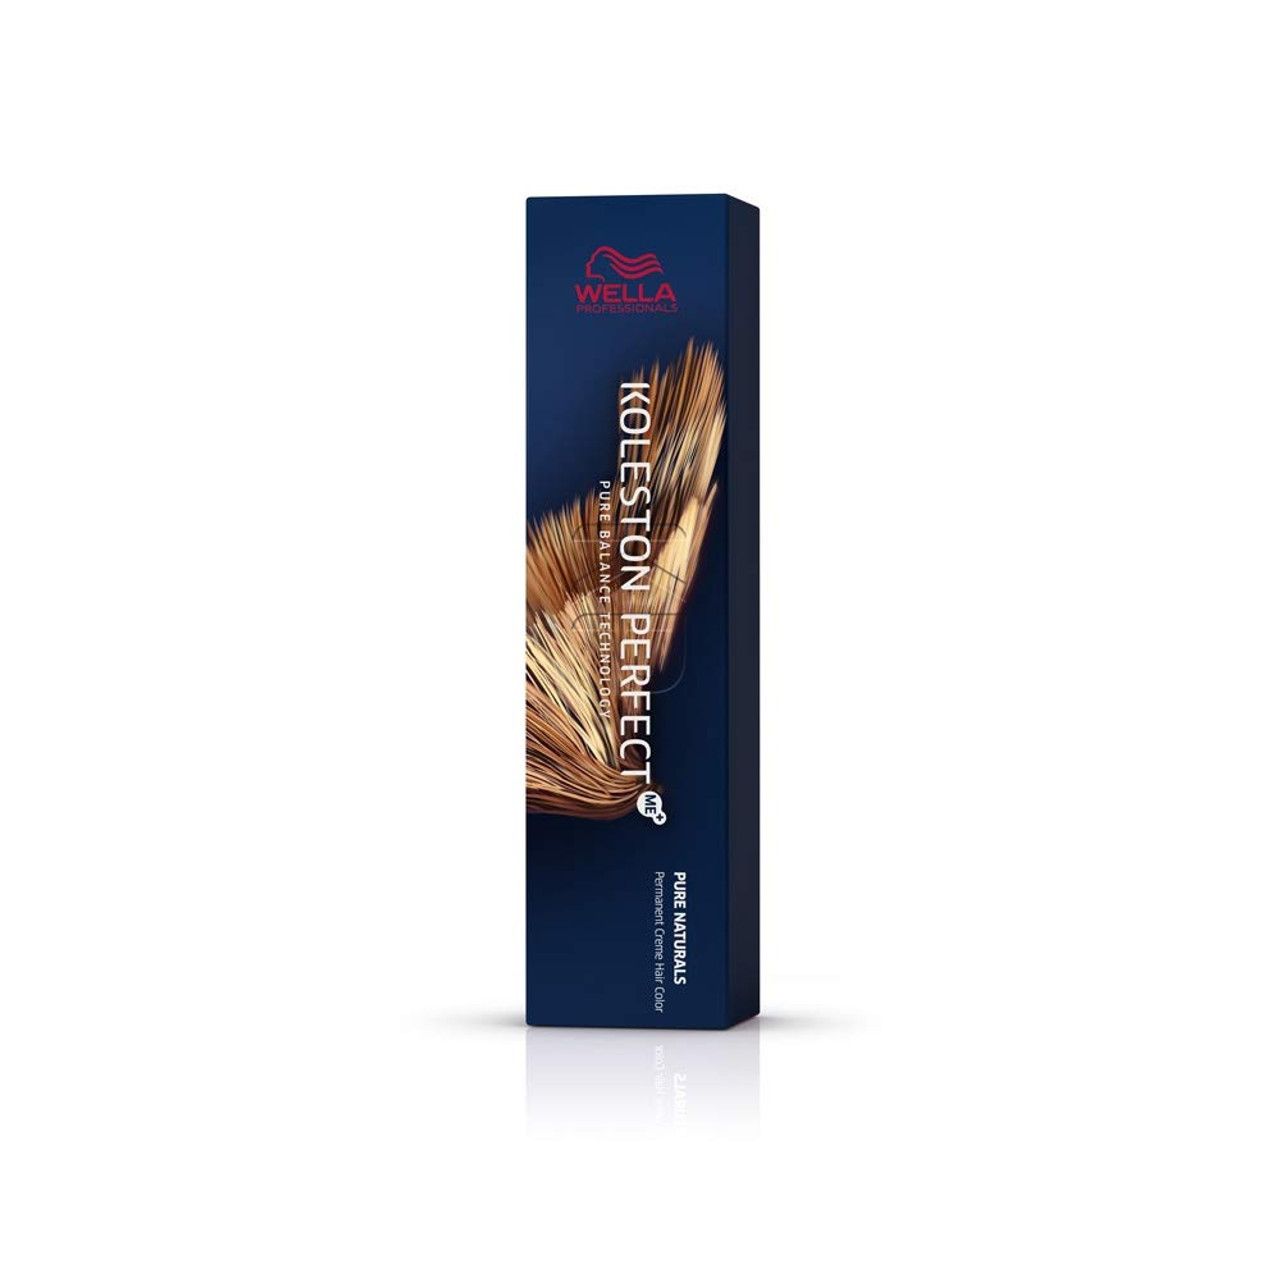 Wella Koleston Perfect ME+ Permanent Creme Hair Color with Free Comb 77/0 Intense Medium Blond/Natural 2 oz